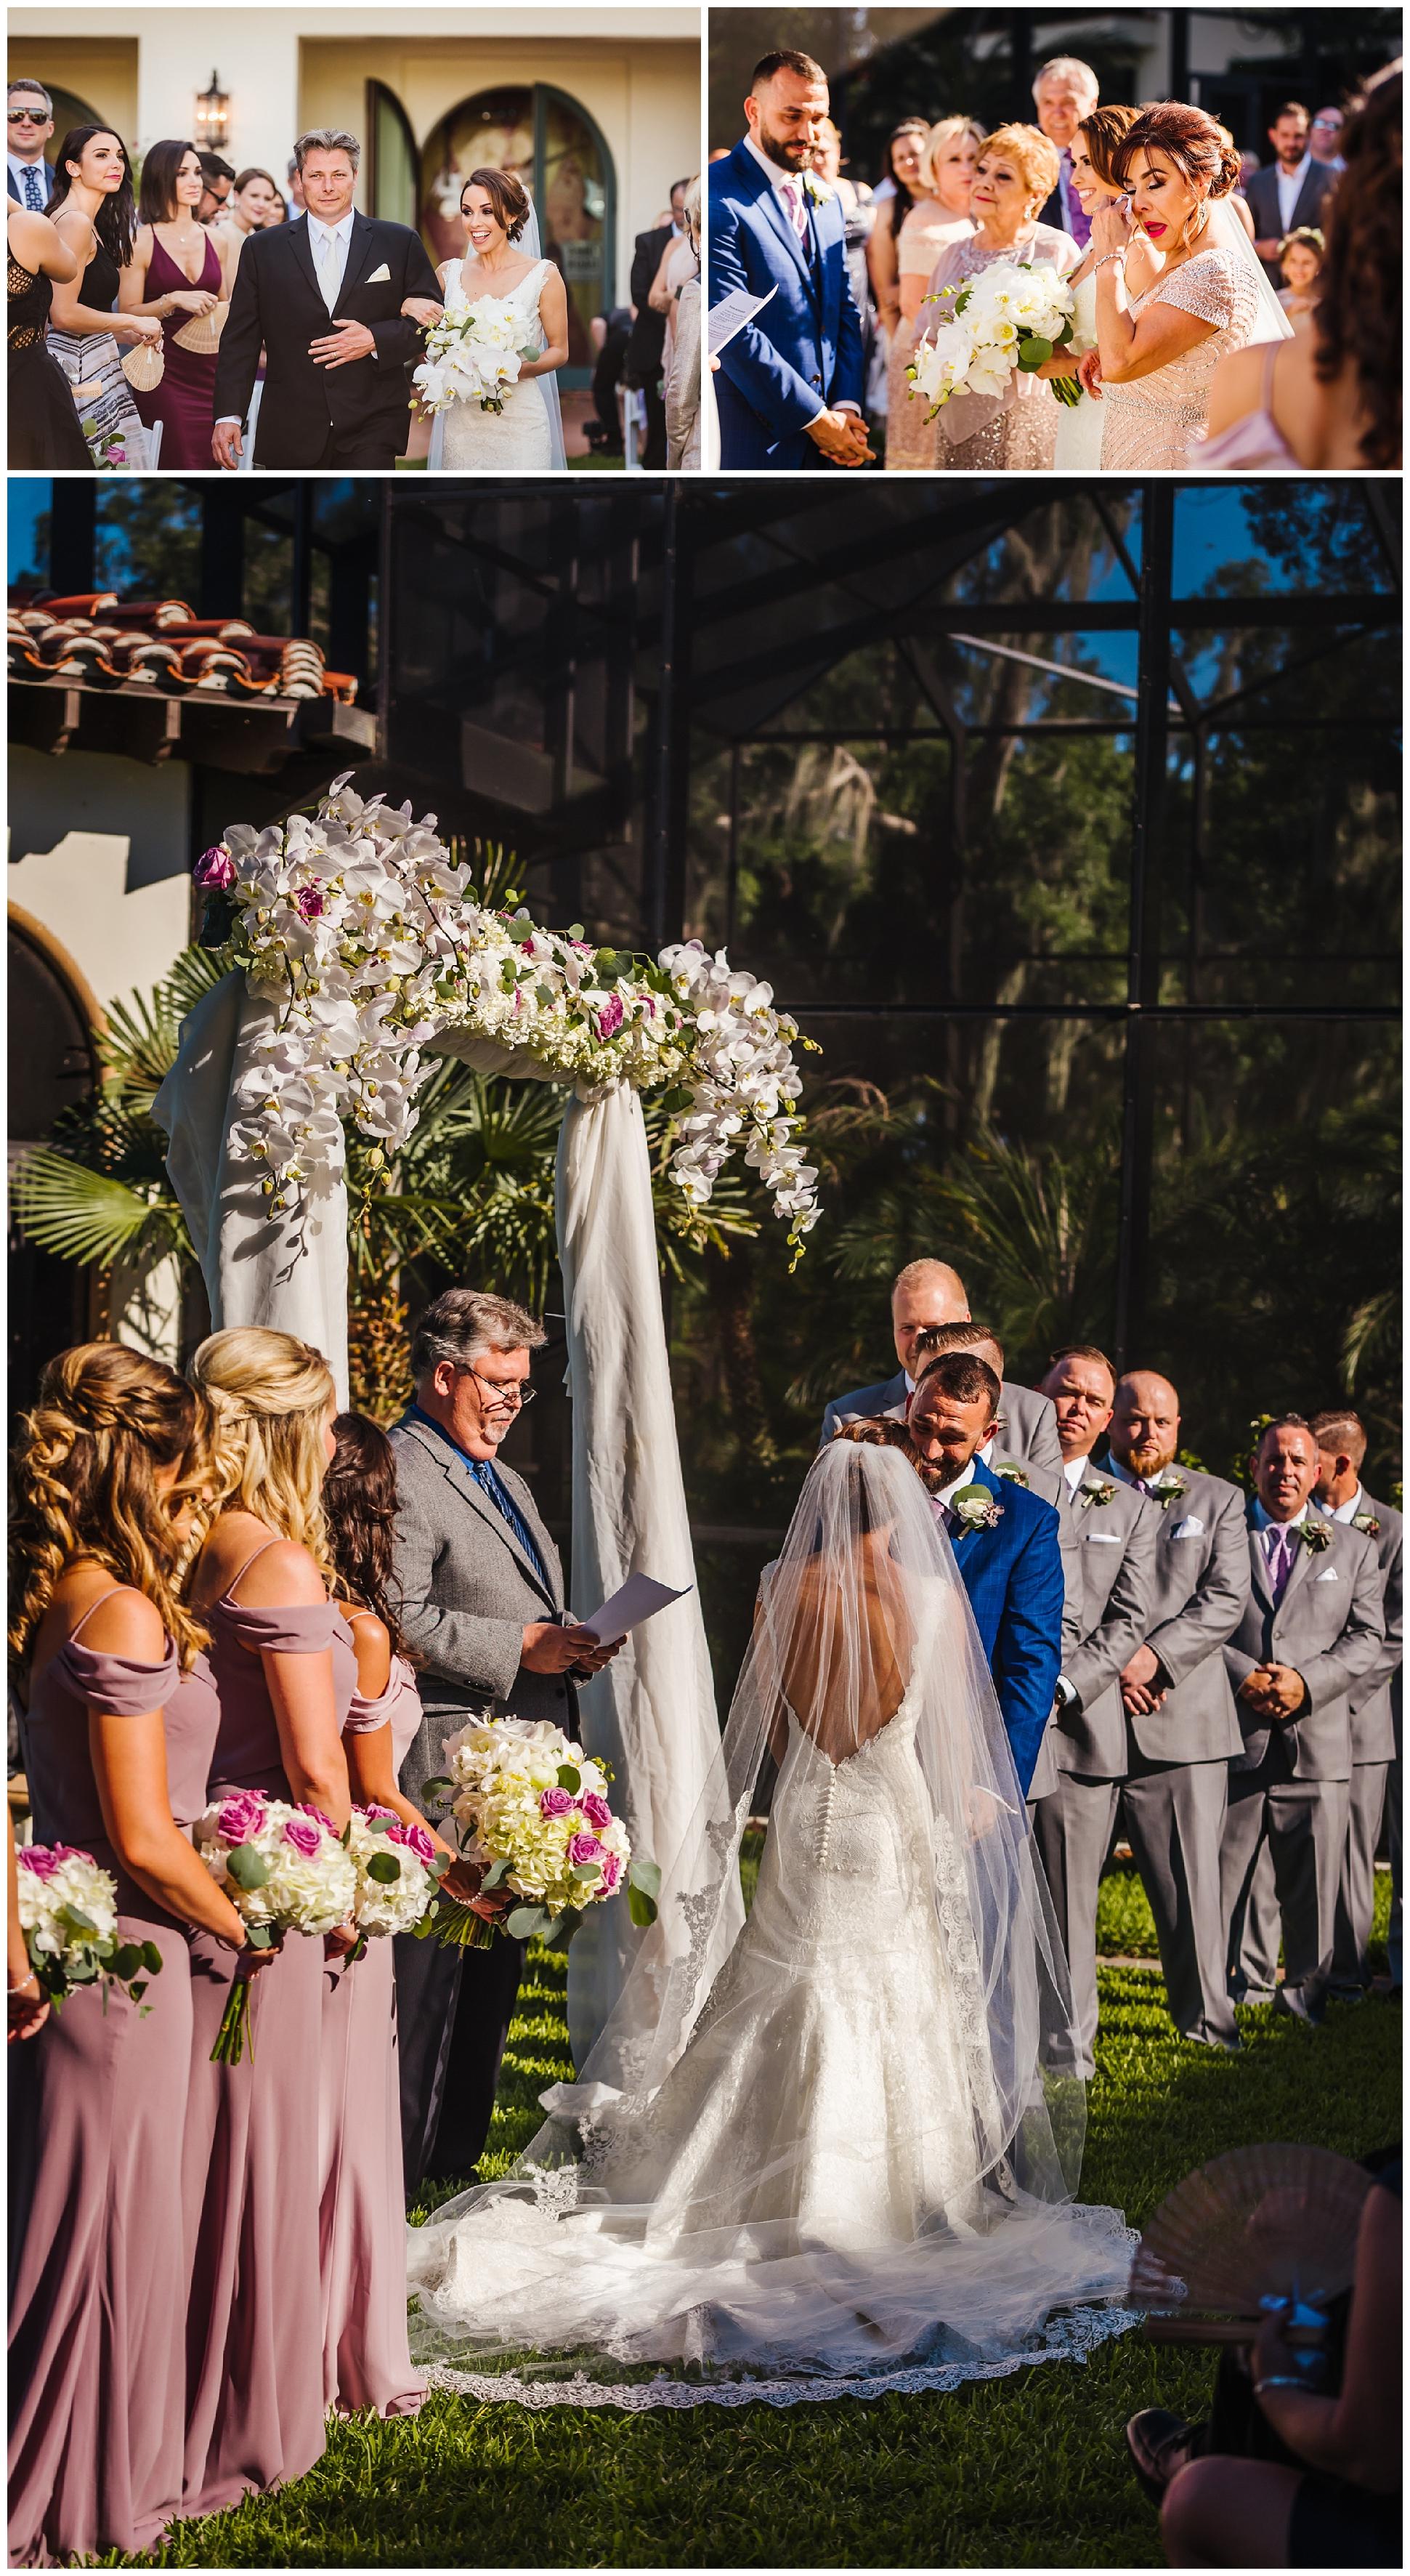 Tampa-luxury-wedding-photographer-mision-lago-private-estate_0027.jpg